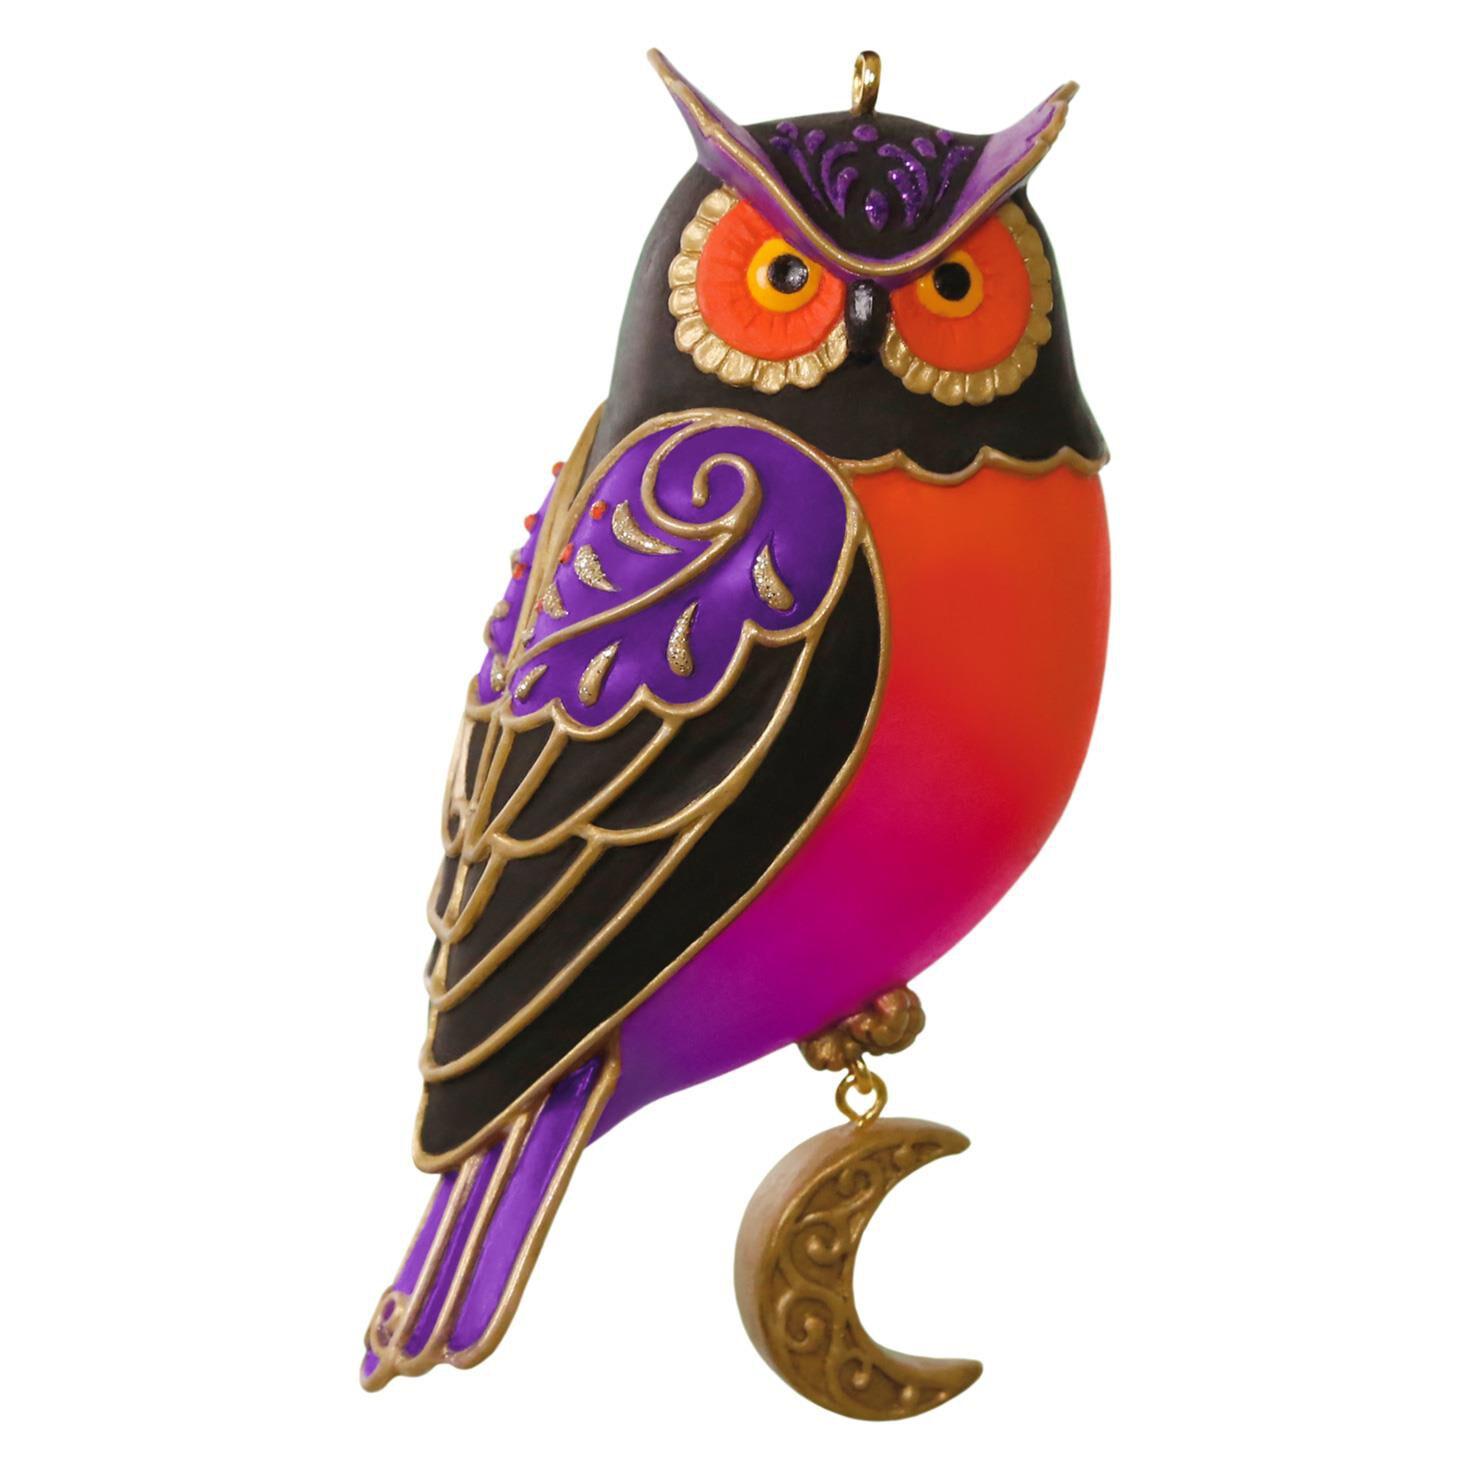 Happy Owloween Halloween Ornament  Keepsake Ornaments  Hallmark